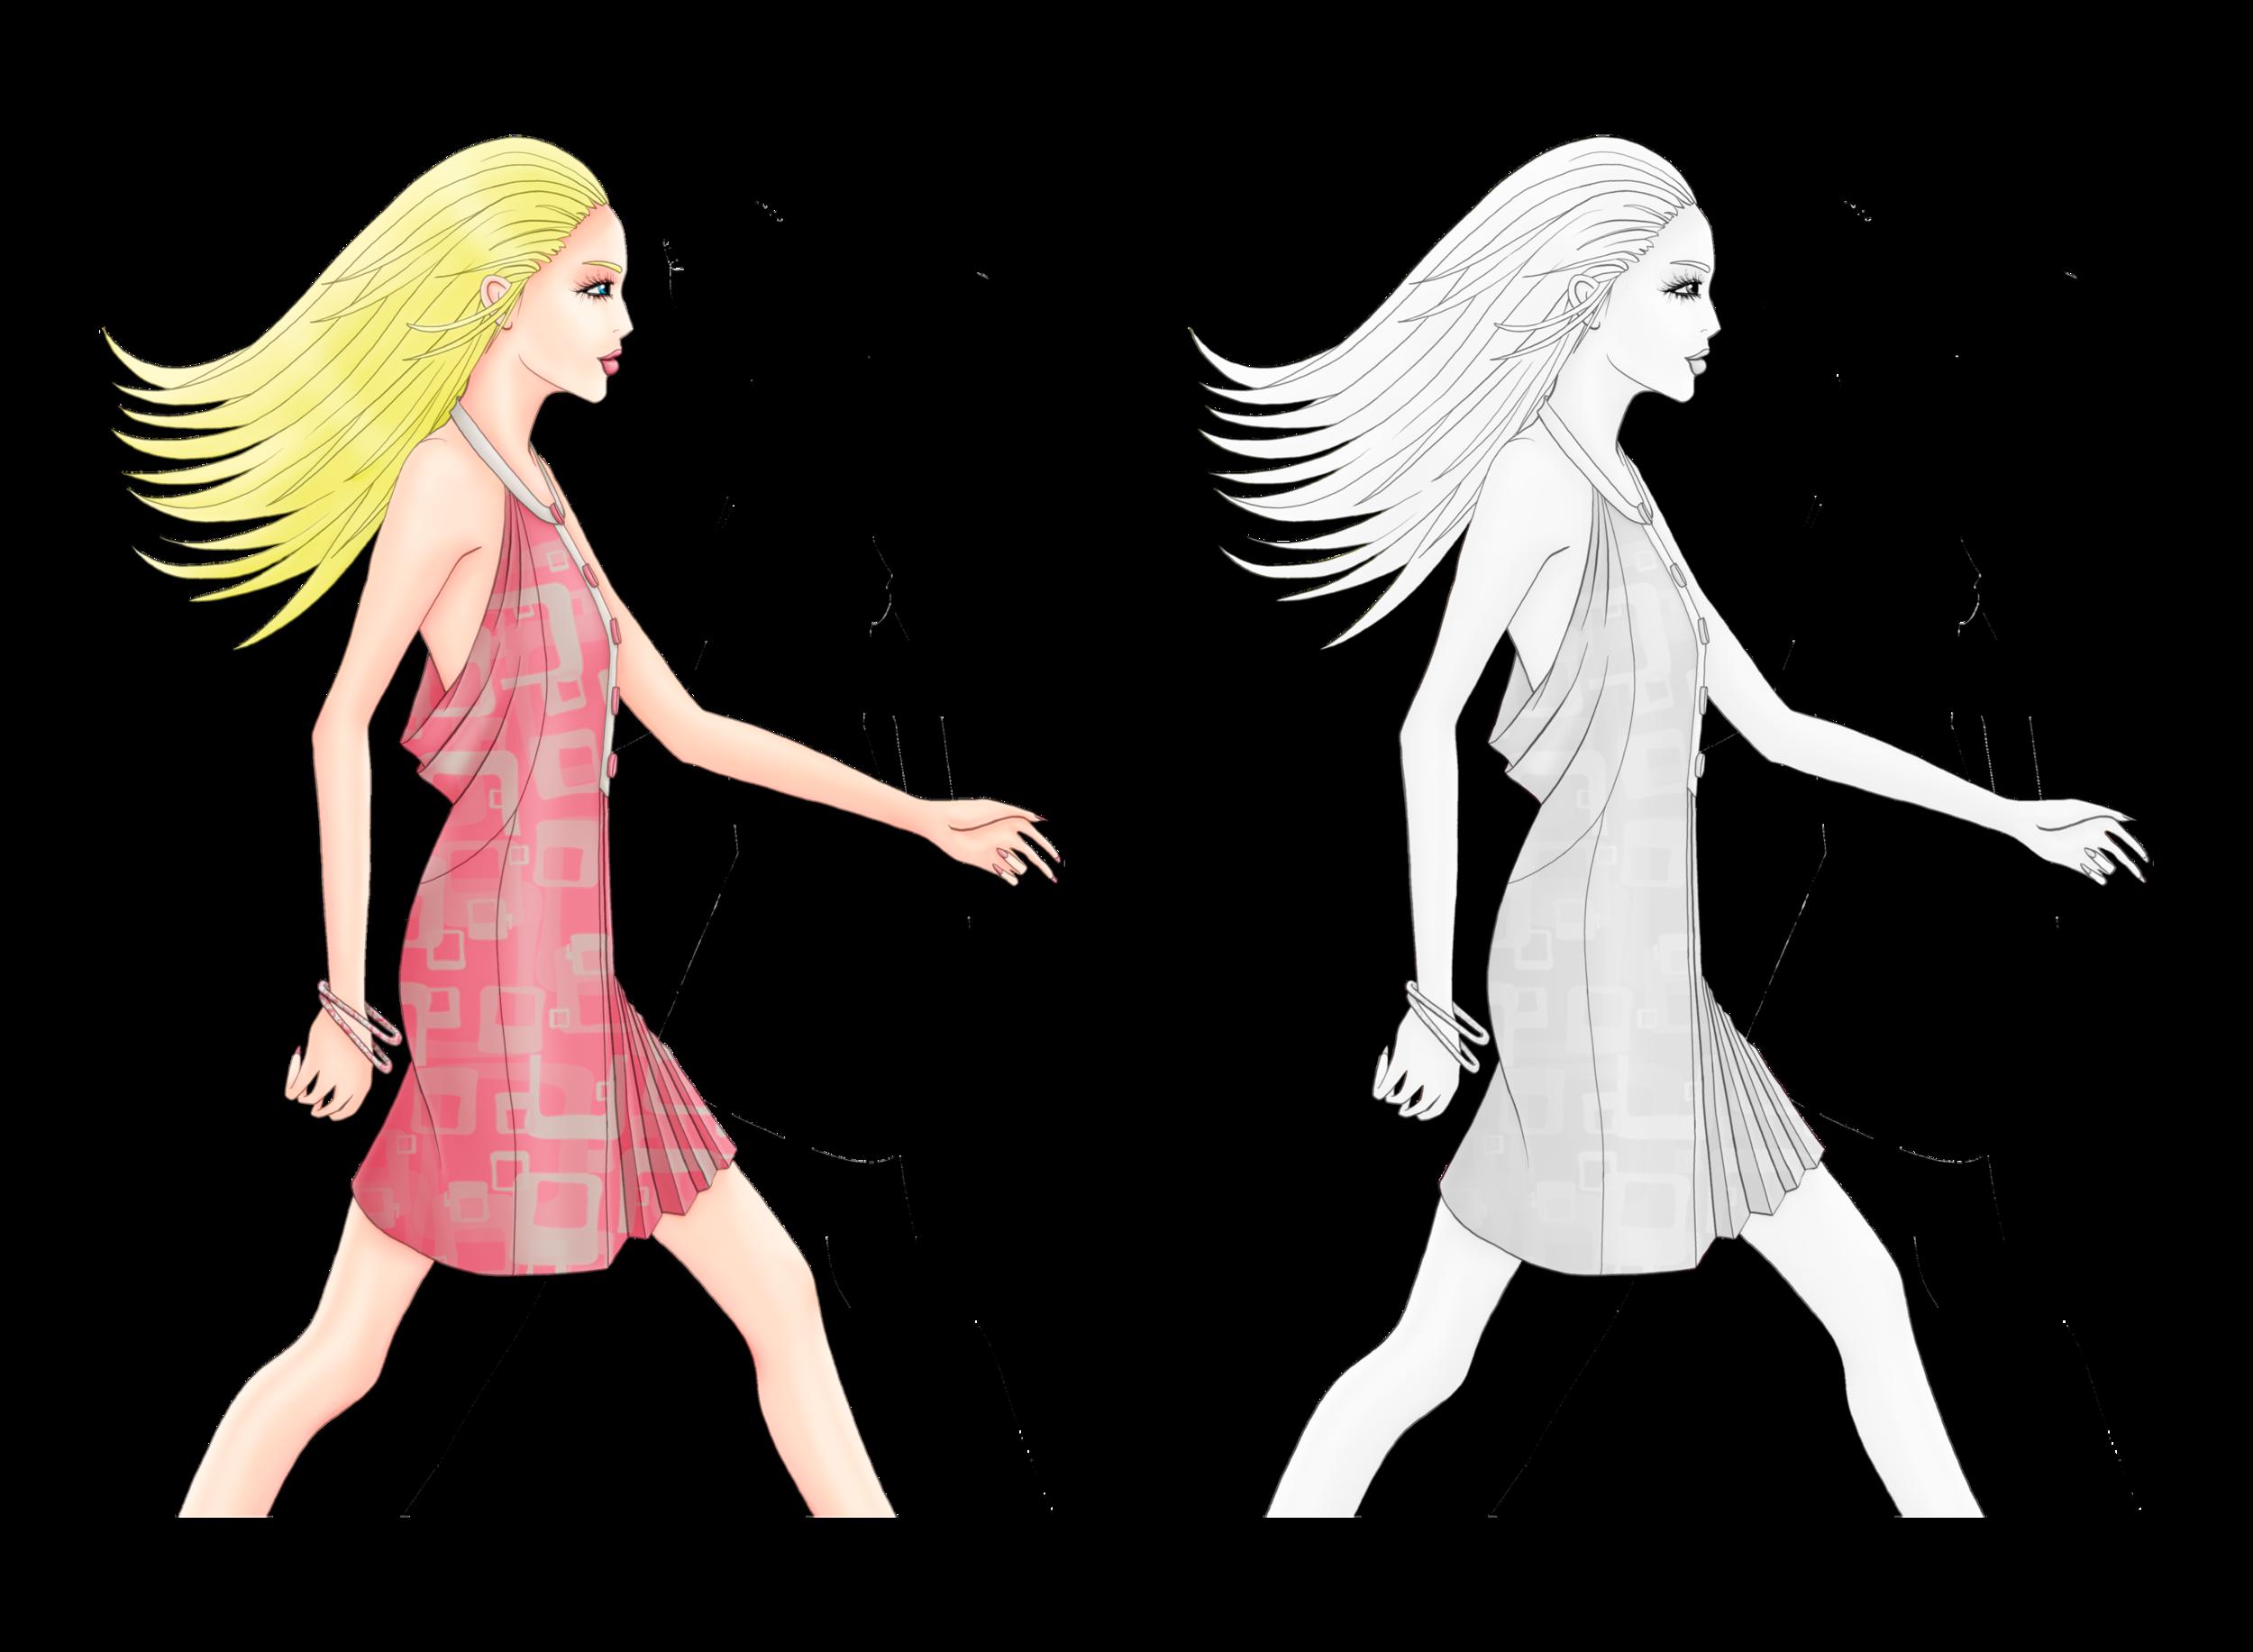 Illustrations_05.png